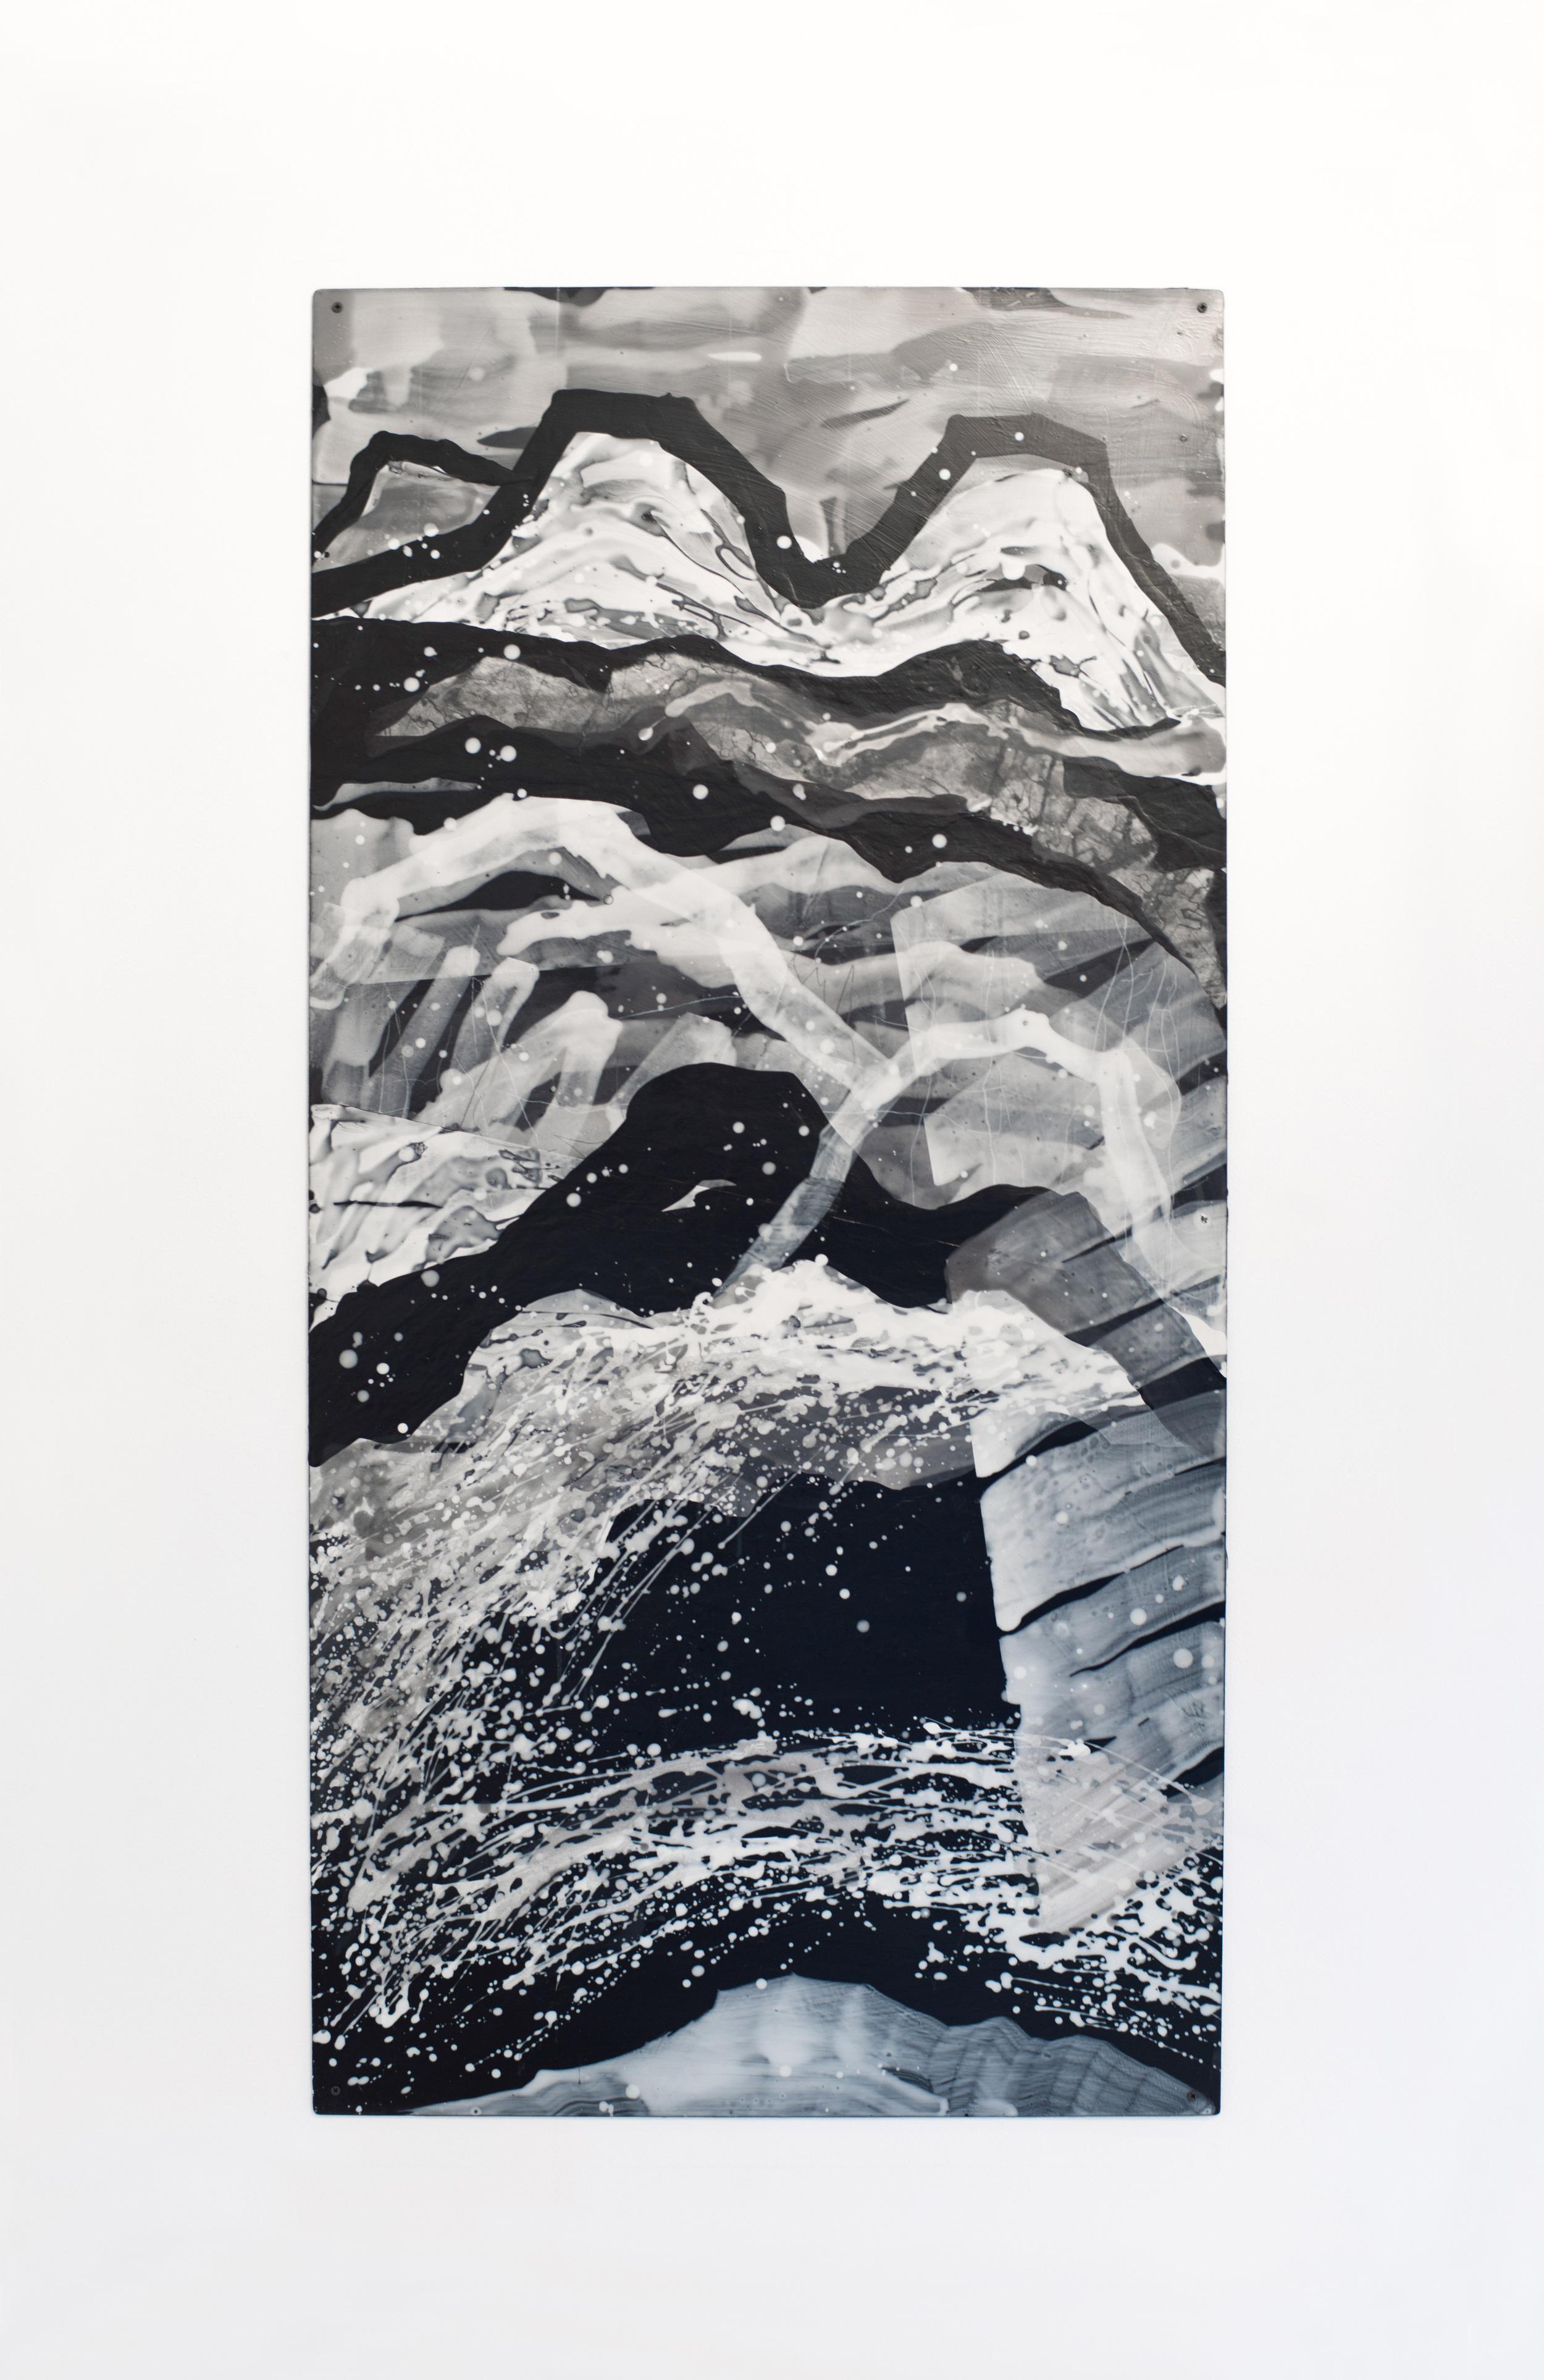 Nancy Manter    Endless Landscape #1 , 2012   Collage, distemper on aluminum panel  60 x 40 inches